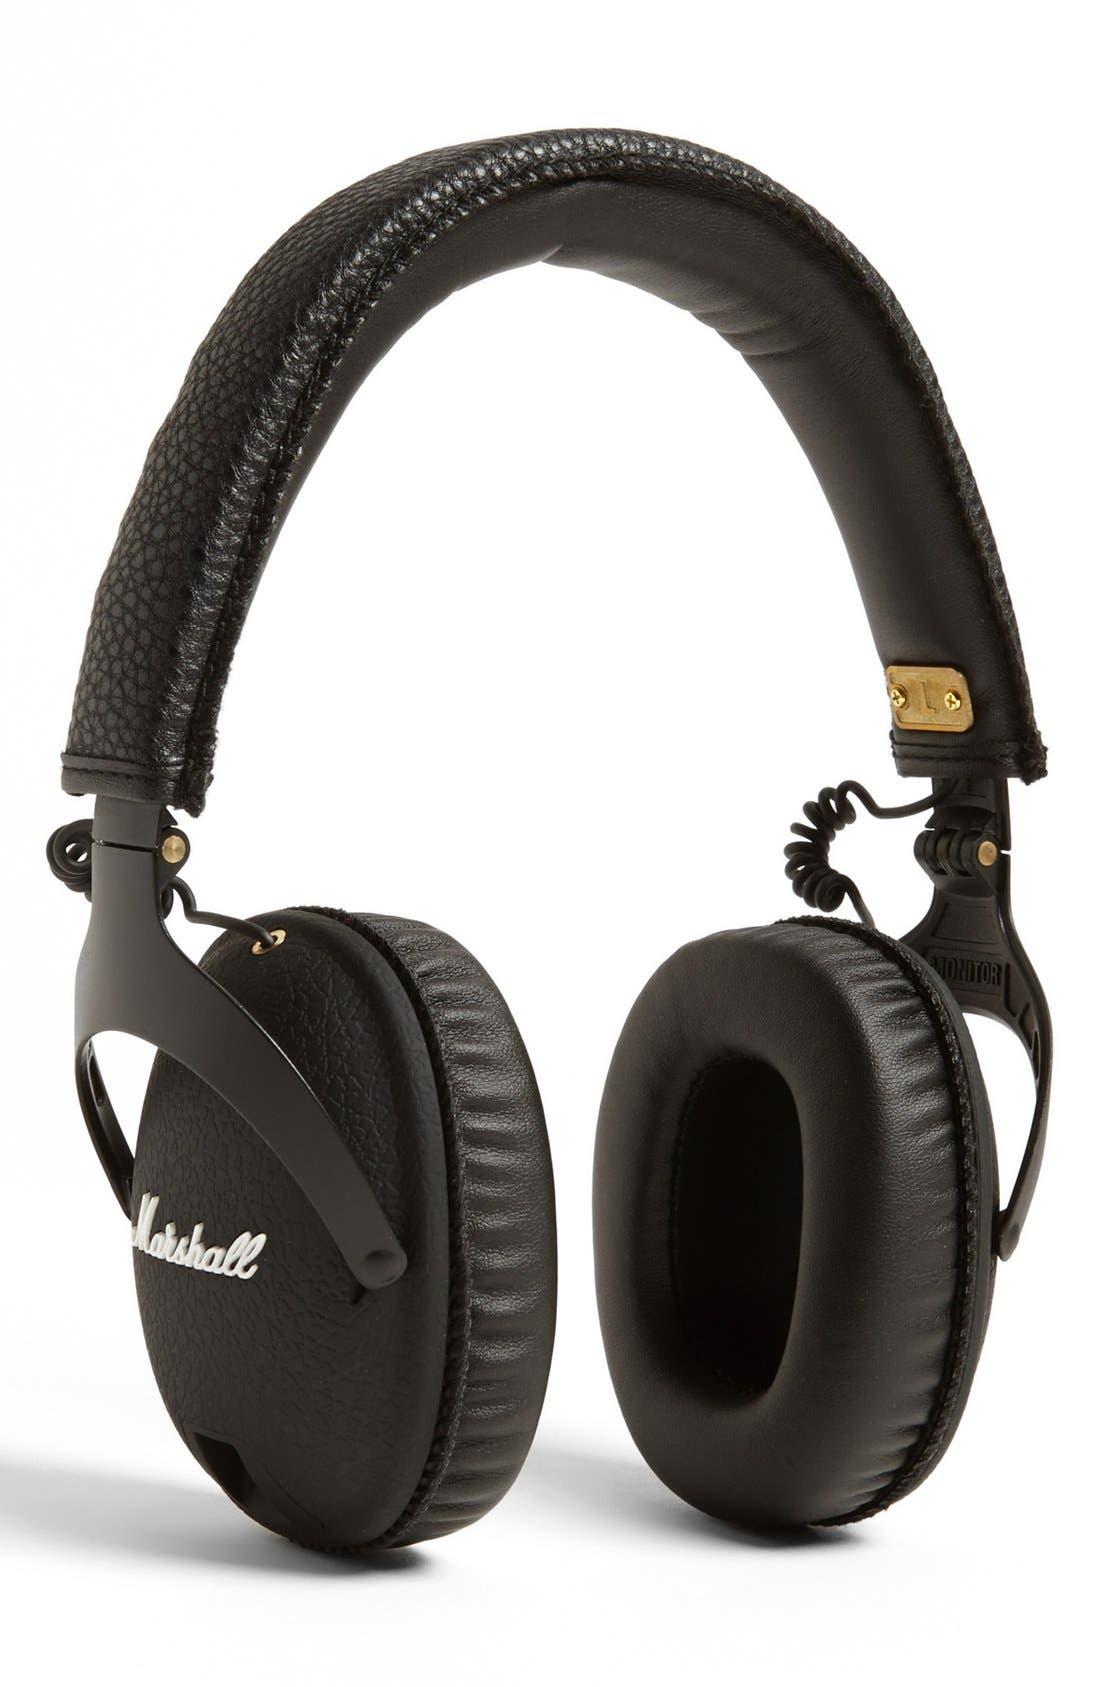 Main Image - Marshall 'Monitor' Over Ear Headphones